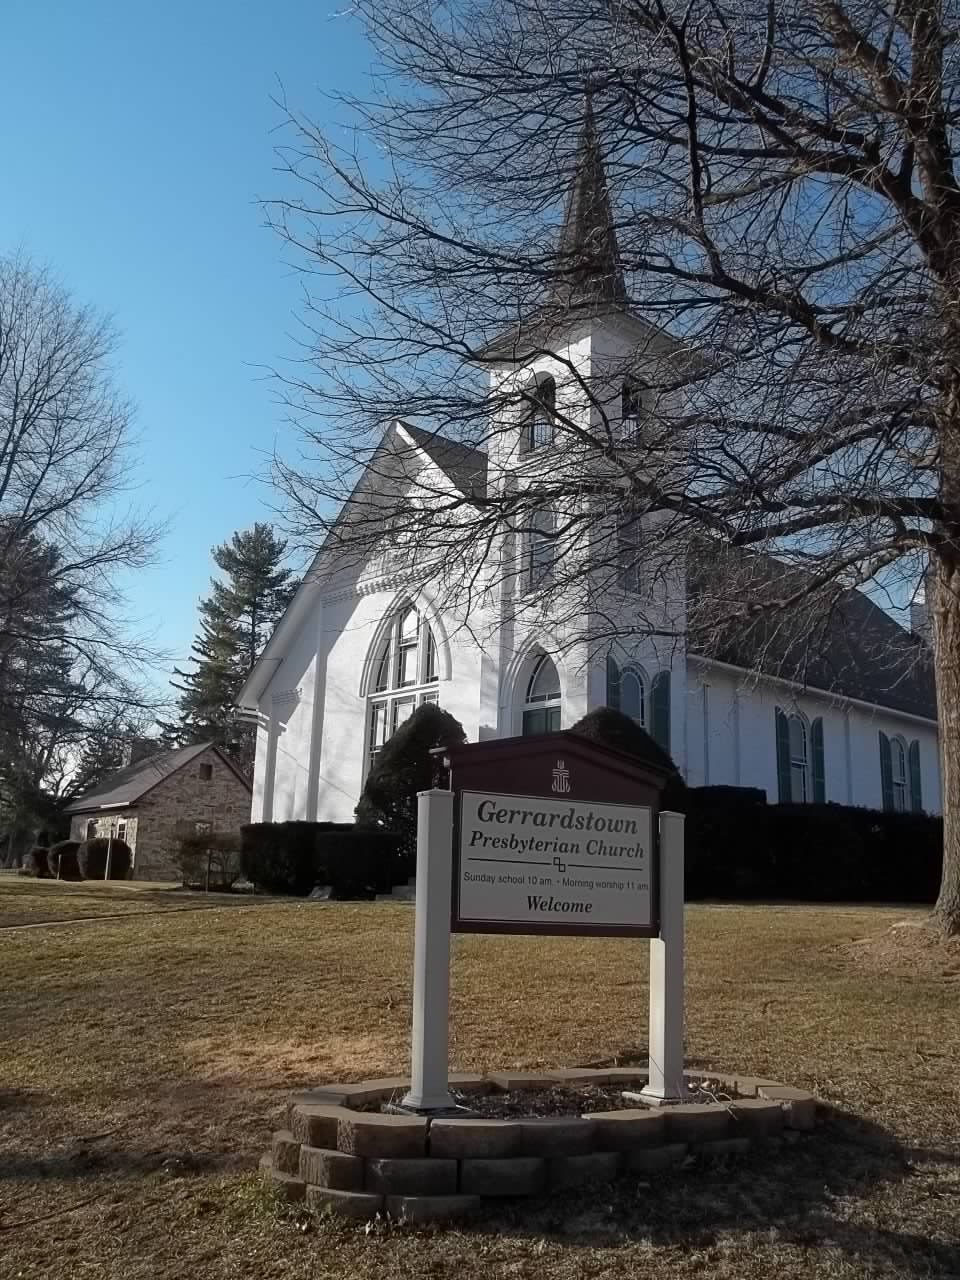 Gerrardstown Presbyterian Church Cemetery